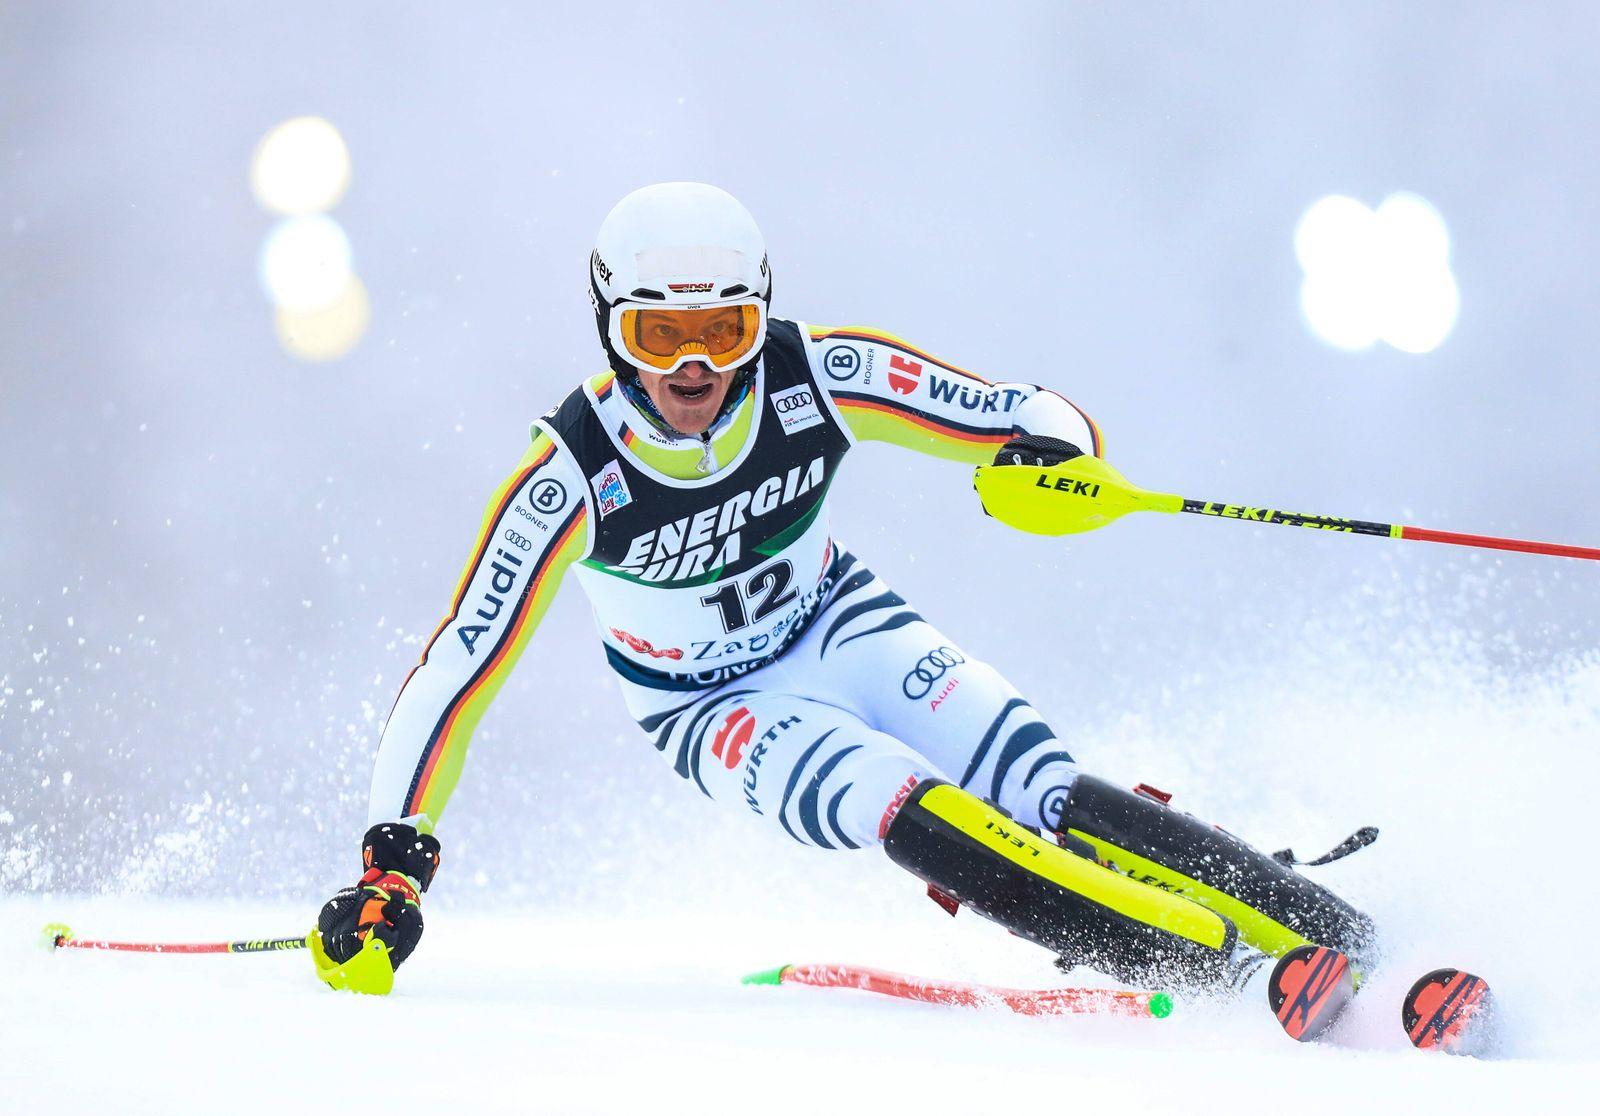 Audi FIS Alpine Ski World Cup - Men s Slalom ZAGREB, CROATIA - JANUARY 06: Linus Strasser of Germany during the Audi FIS